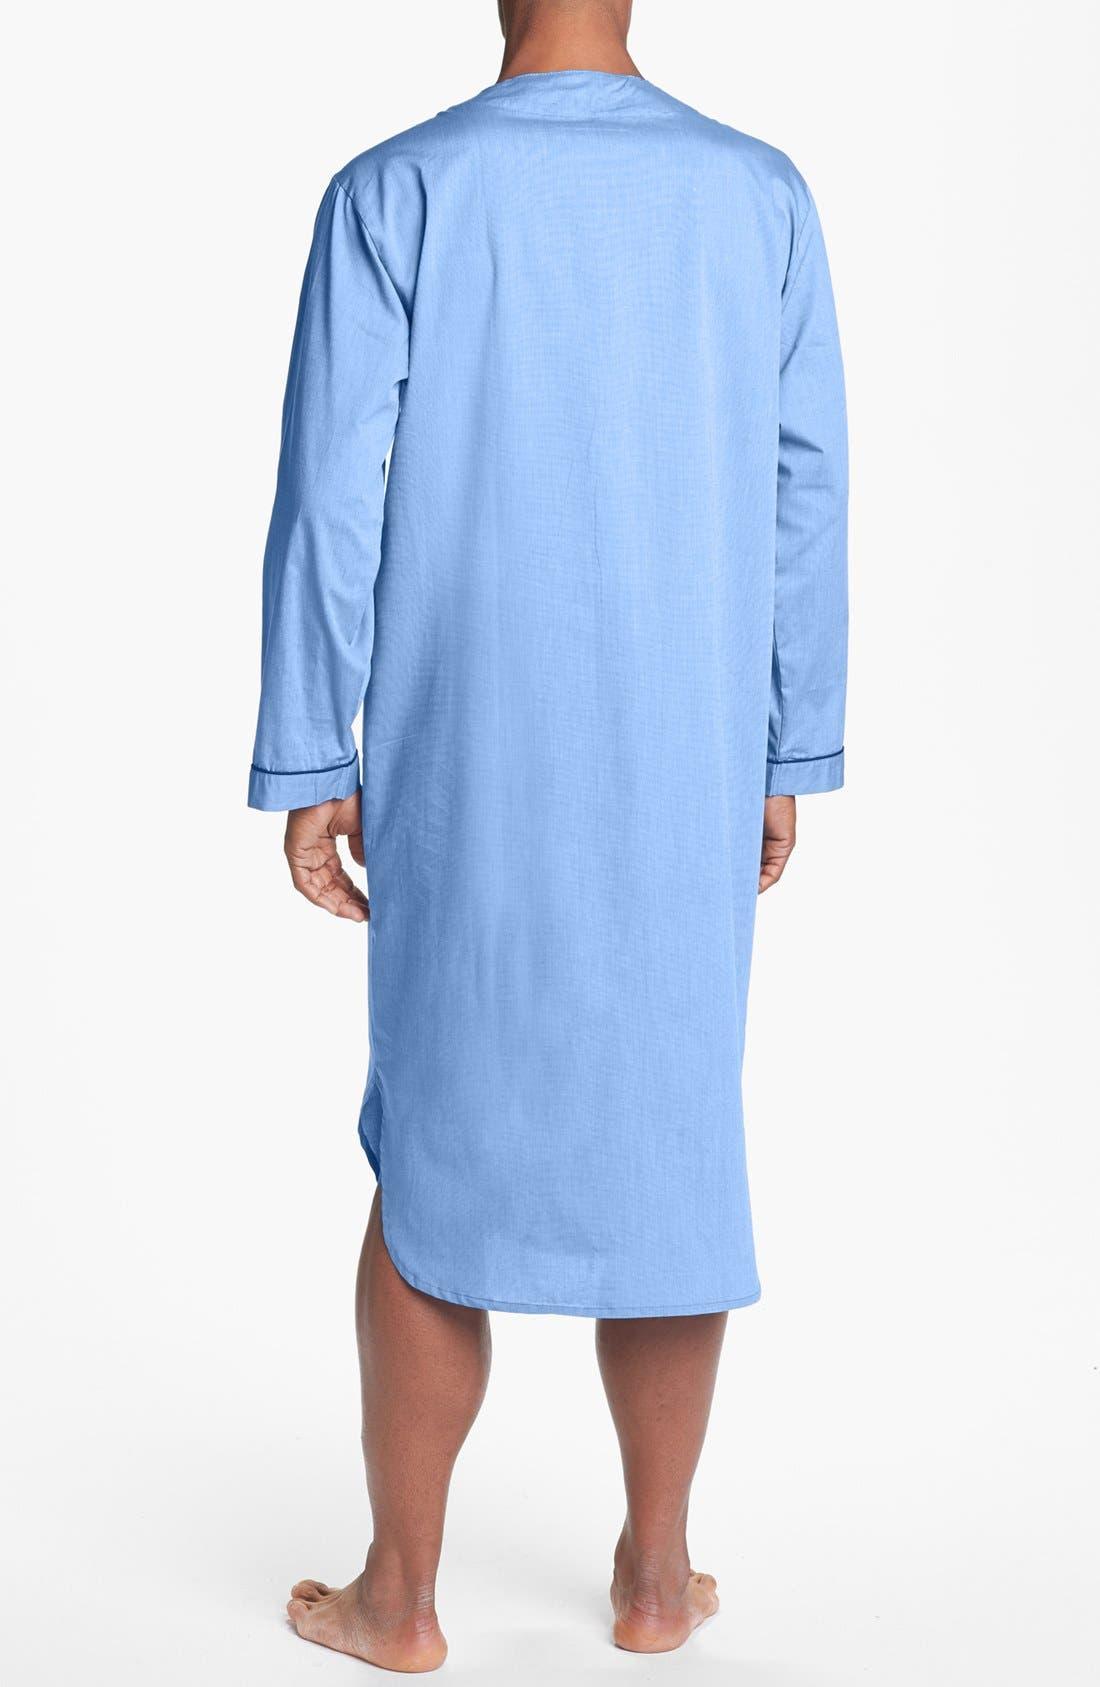 Cotton Nightshirt,                             Alternate thumbnail 2, color,                             Blue